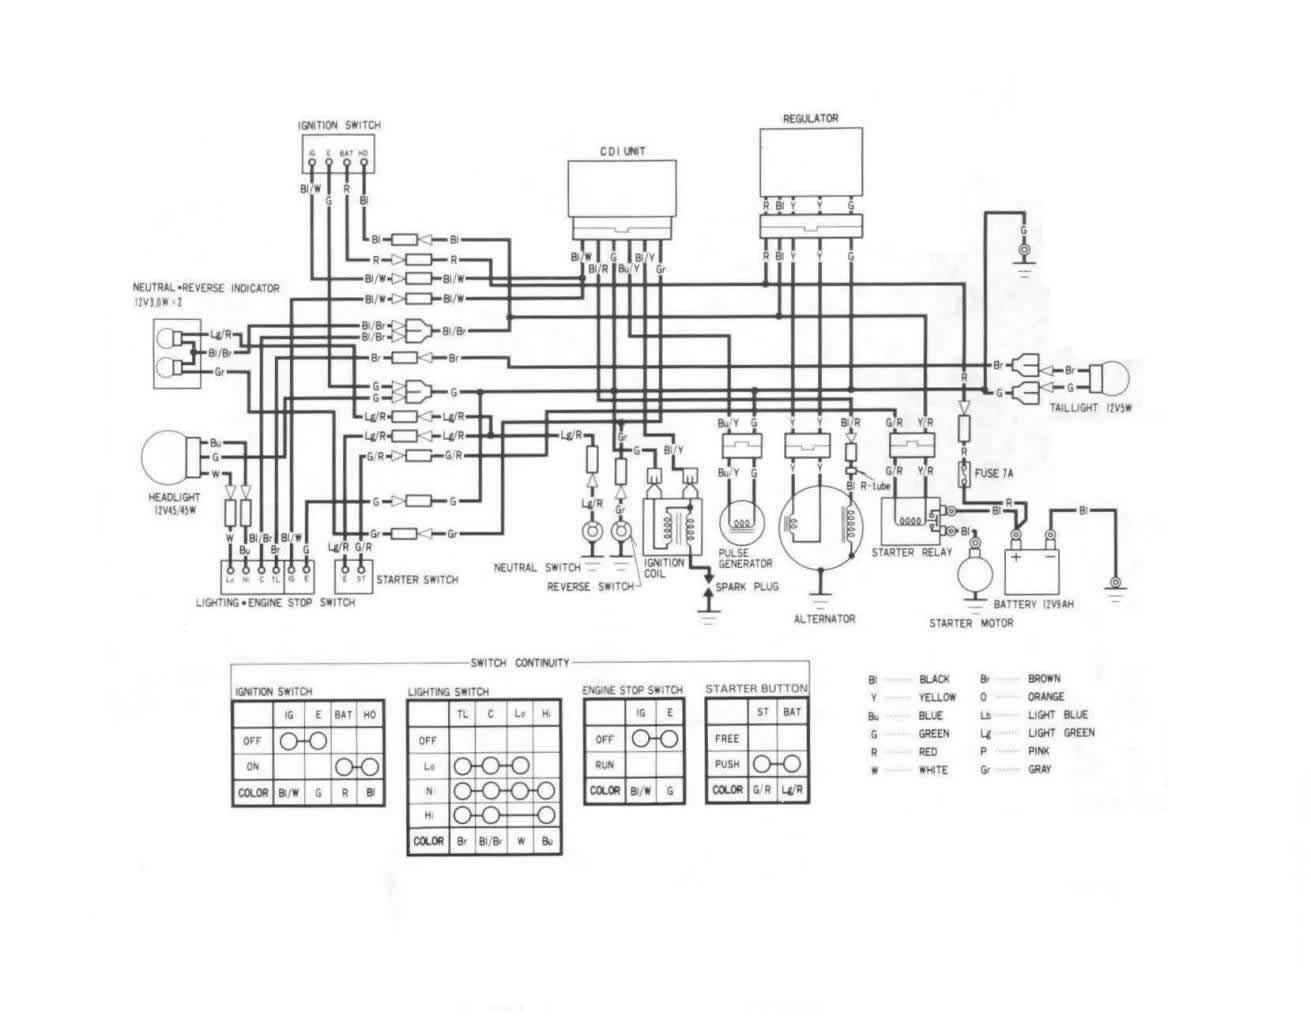 Honda Rancher 350 Wiring Diagram - Wiring Diagram Data sum-build -  sum-build.portorhoca.it | Trx 350 Wiring Diagram 2000 |  | sum-build.portorhoca.it